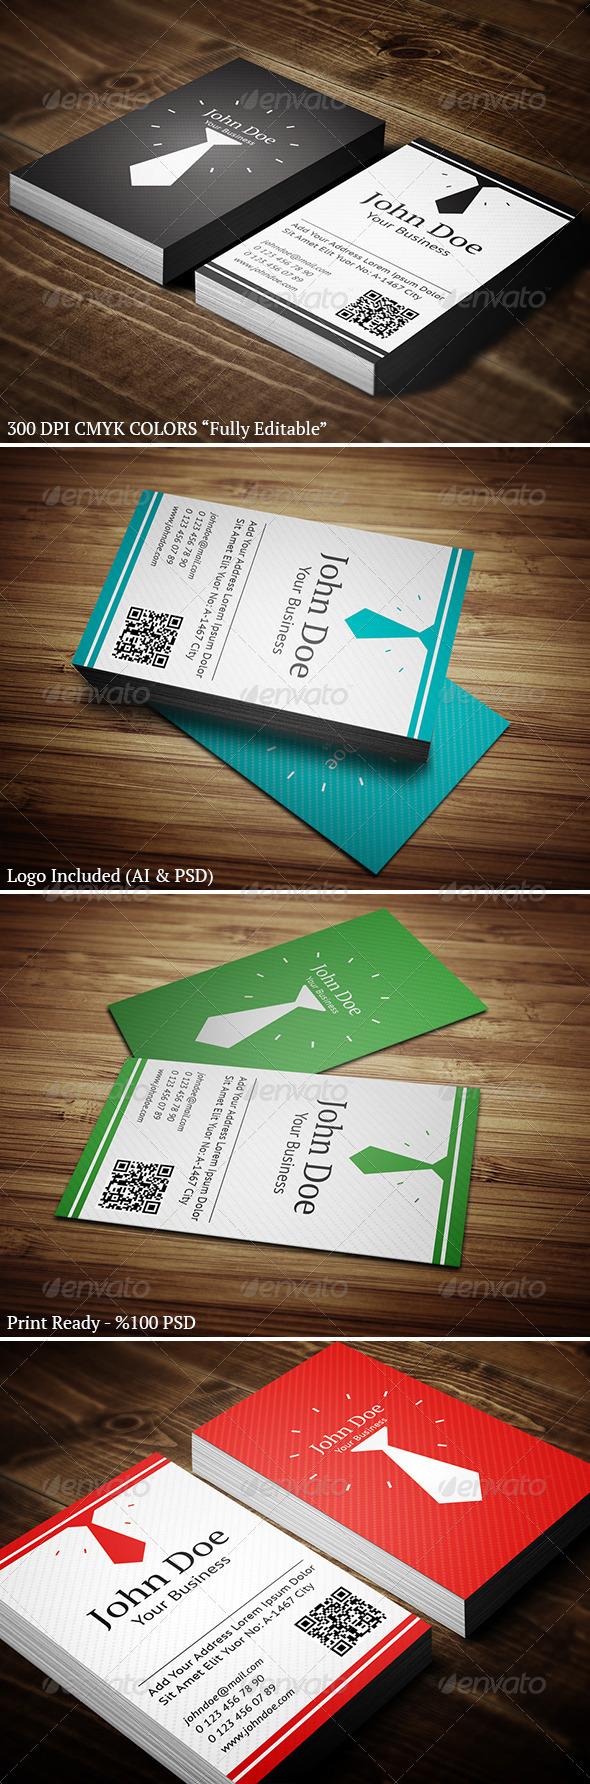 Vertical Business Card 01 | Vertical business cards, Google fonts ...